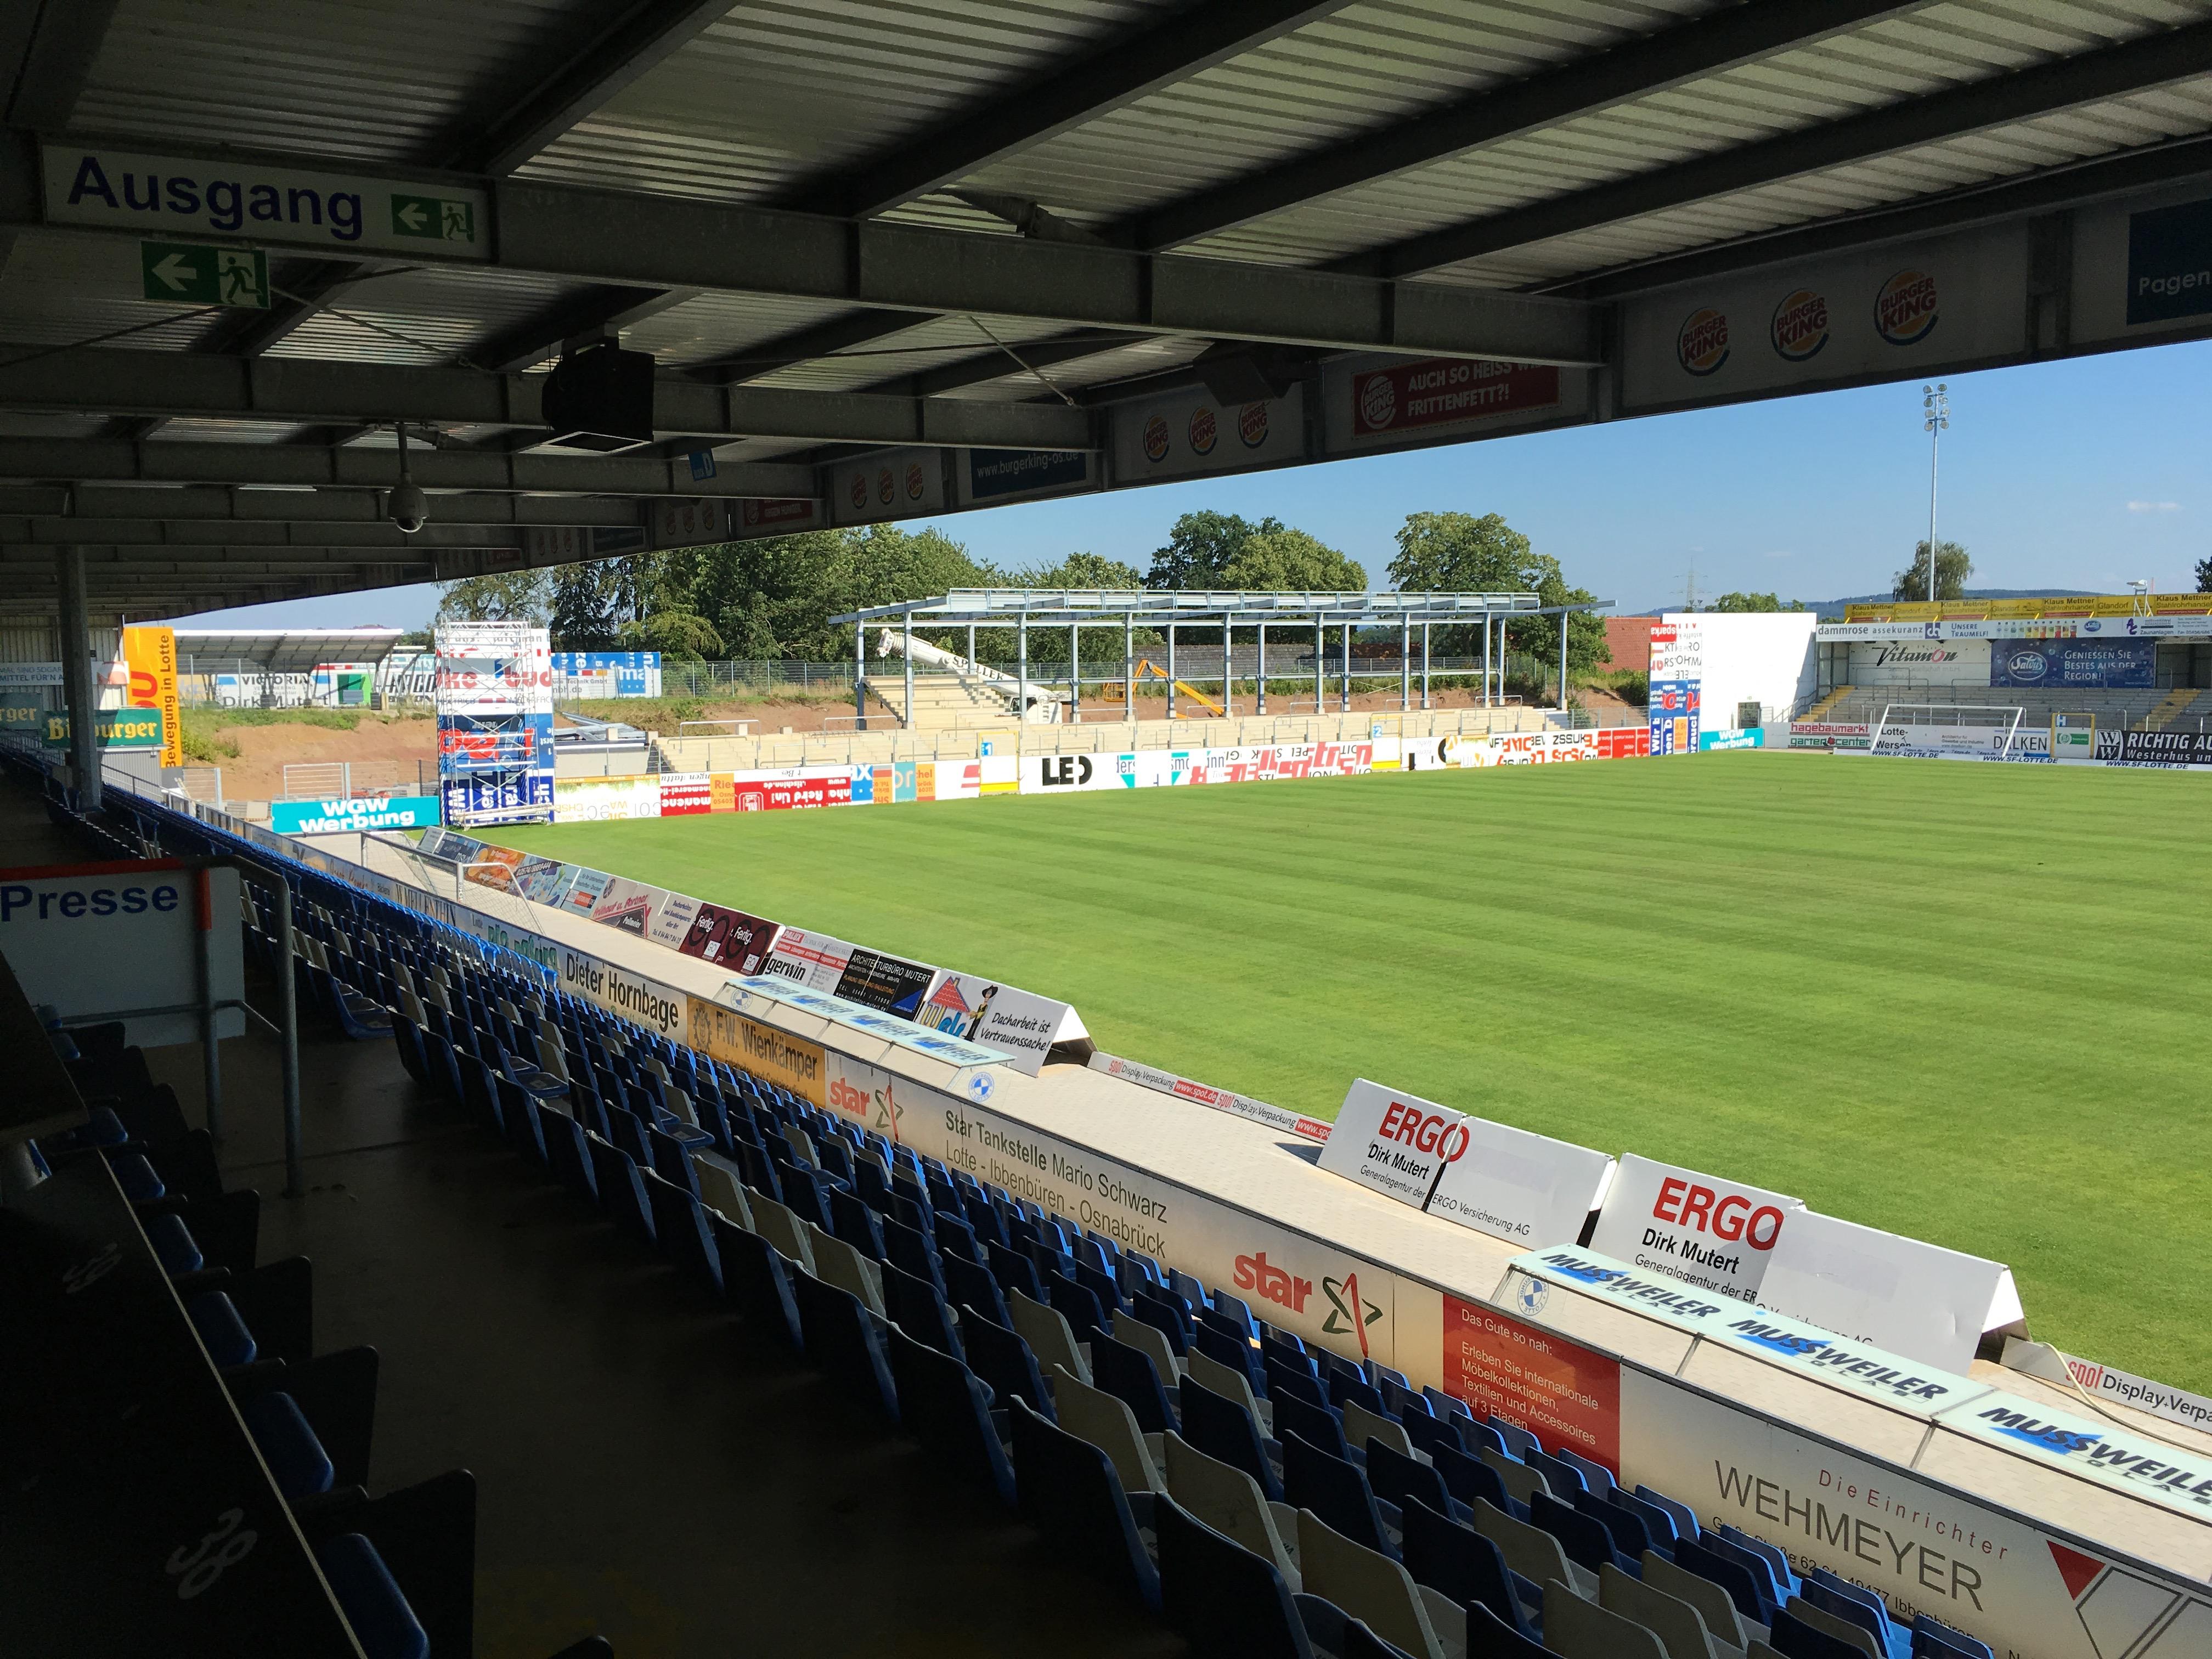 Frimo_Stadion_Osttrib%C3%BCne_Ausbau.jpg